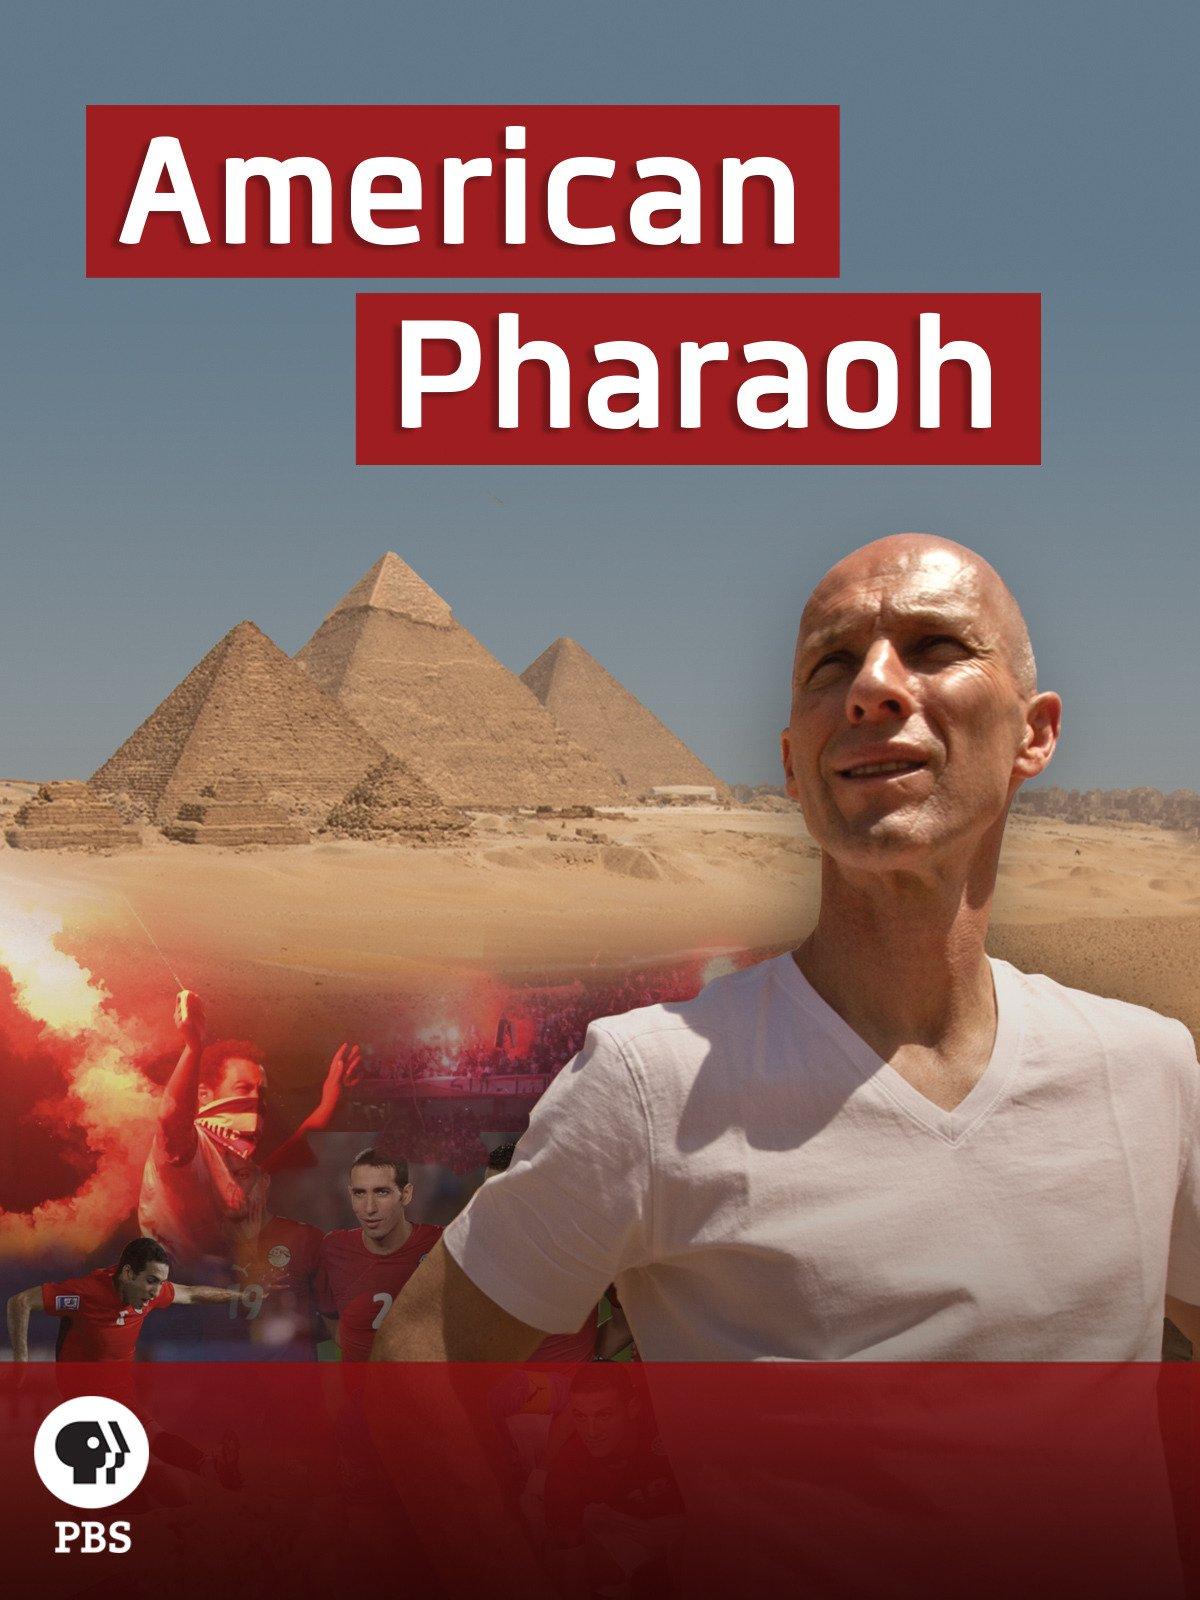 American Pharaoh